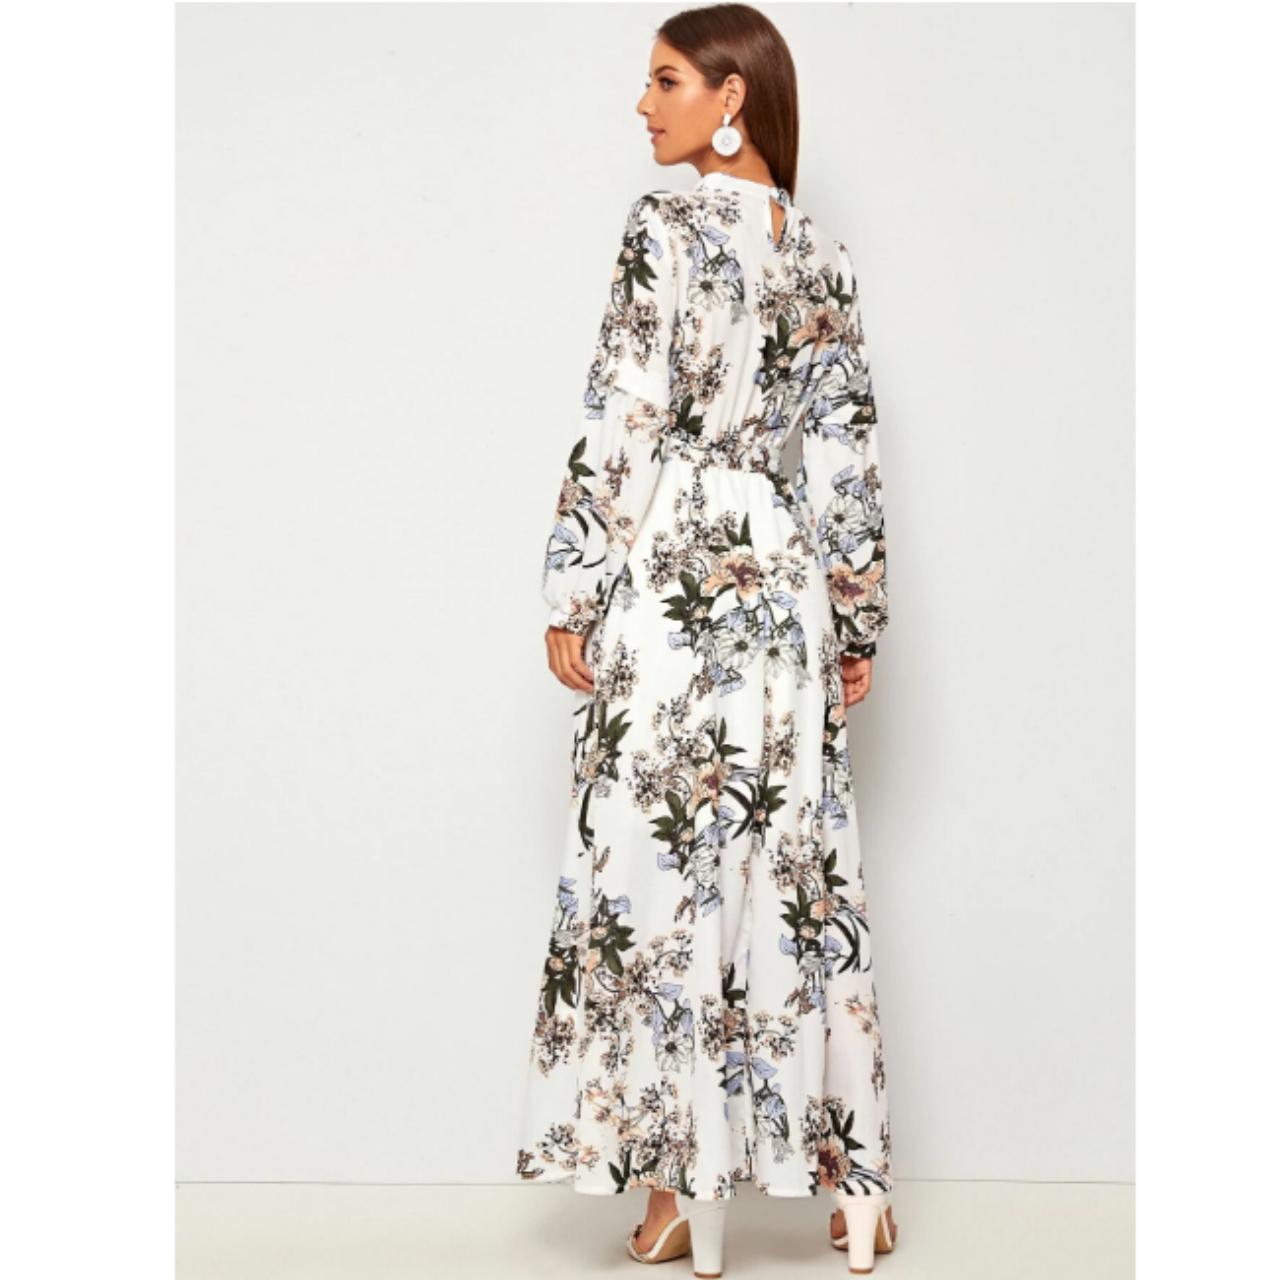 Allover floral print self tie swing maxi dress l